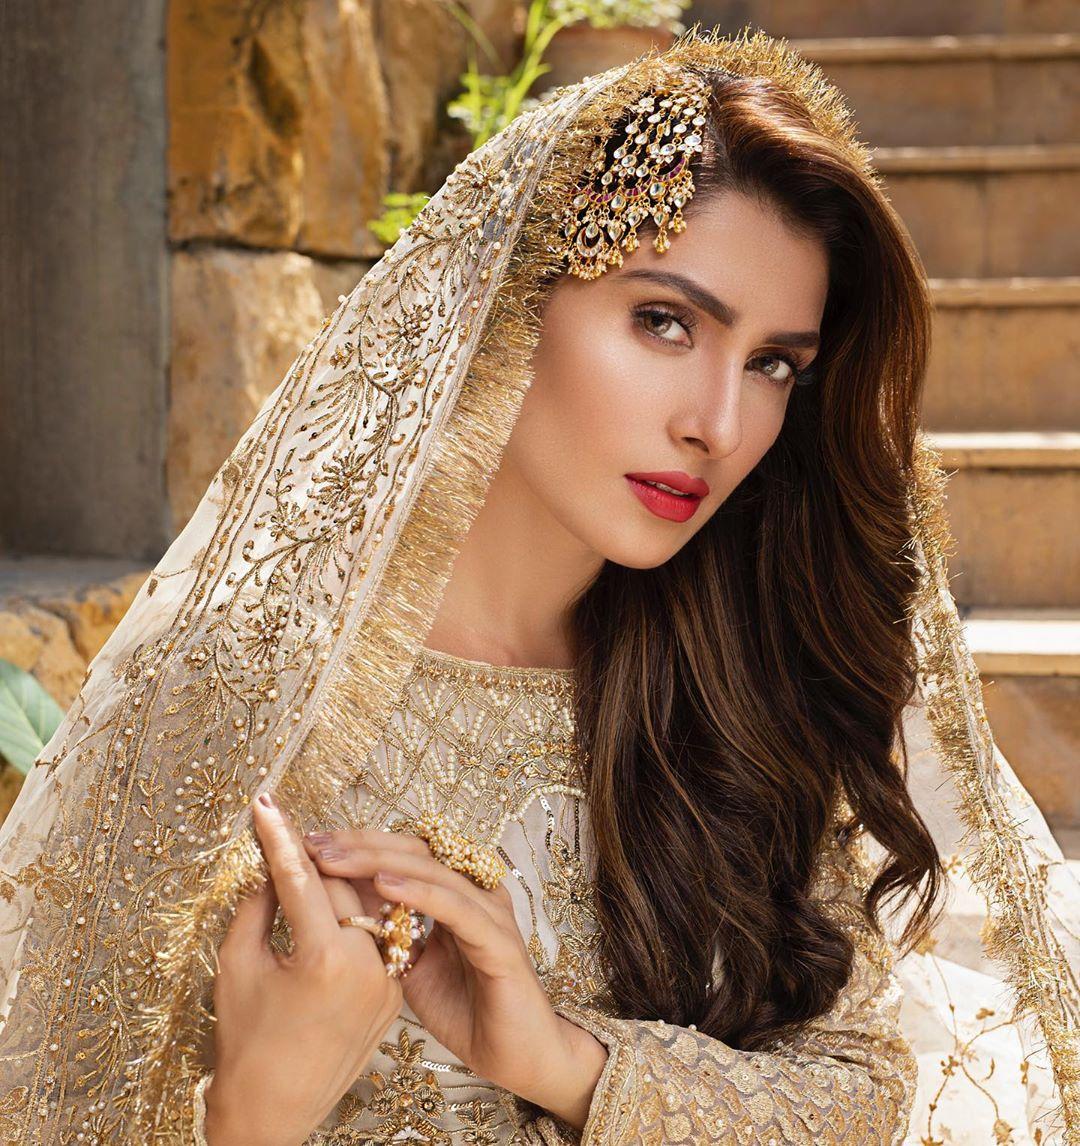 Best Bridal Looks For This Wedding Season